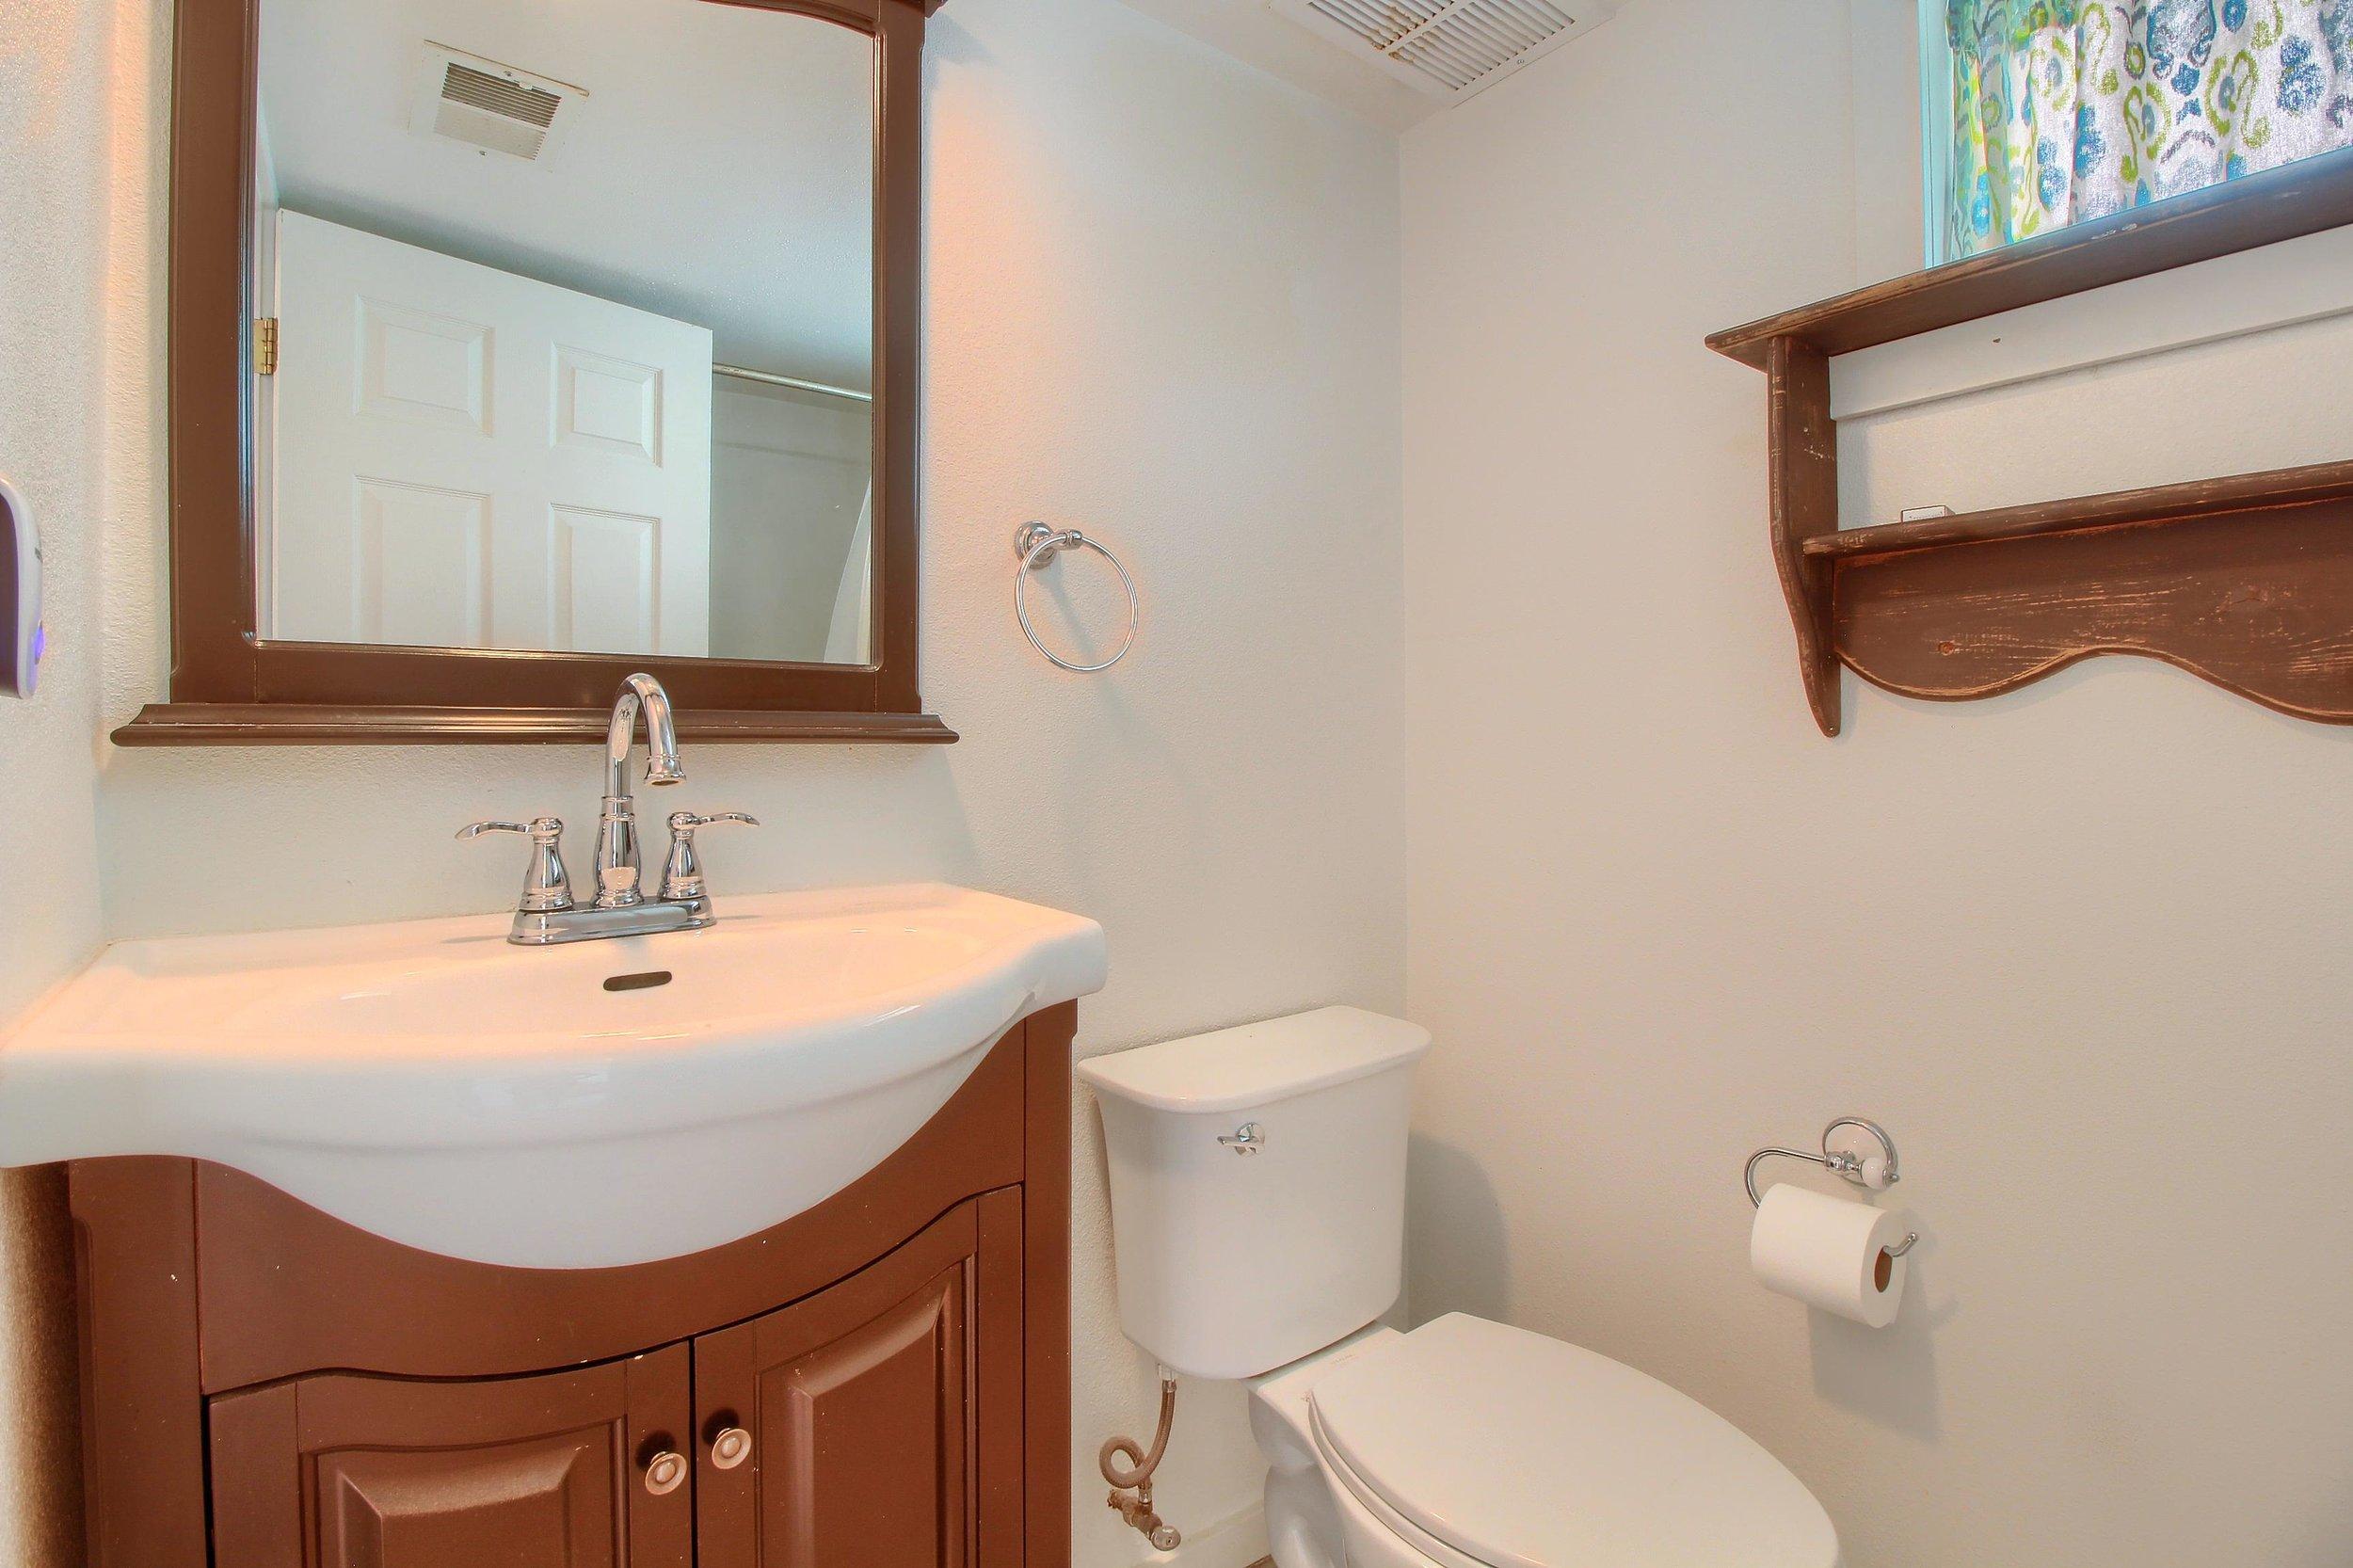 07_Bathroom_IMG_1066.JPG